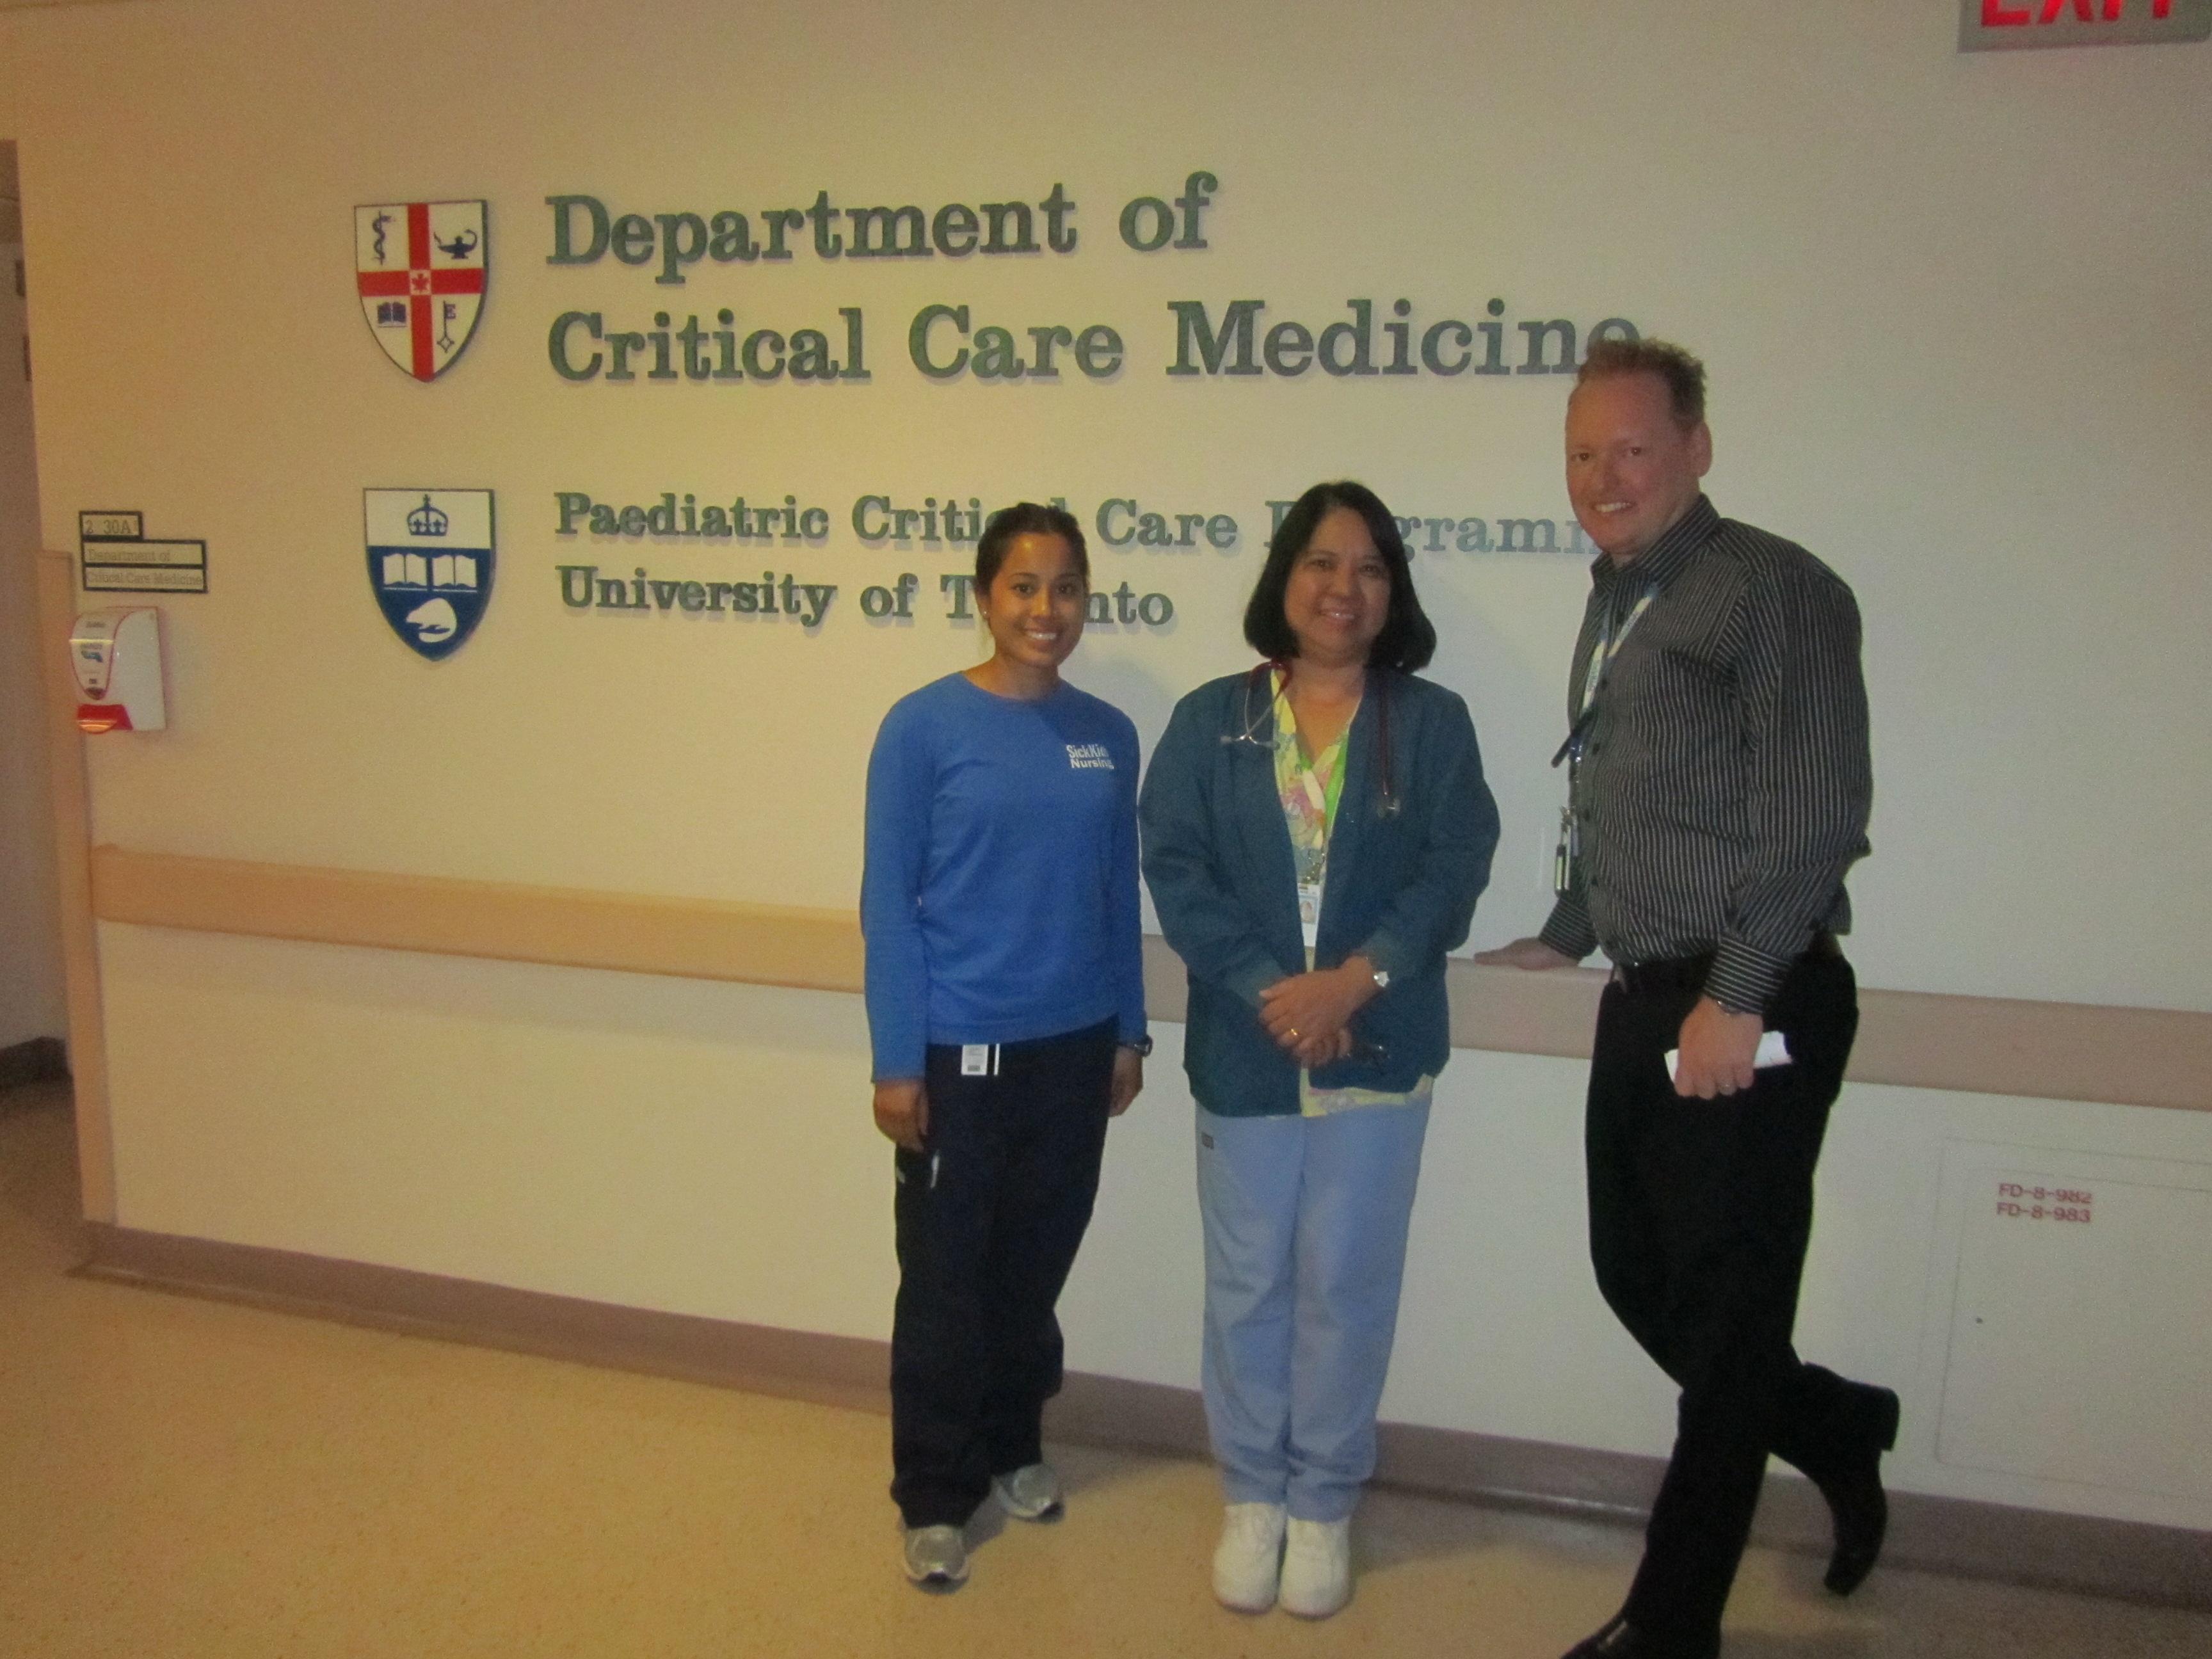 Rowena Zamora with colleagues, Elisa Cercado and Craig Campbell